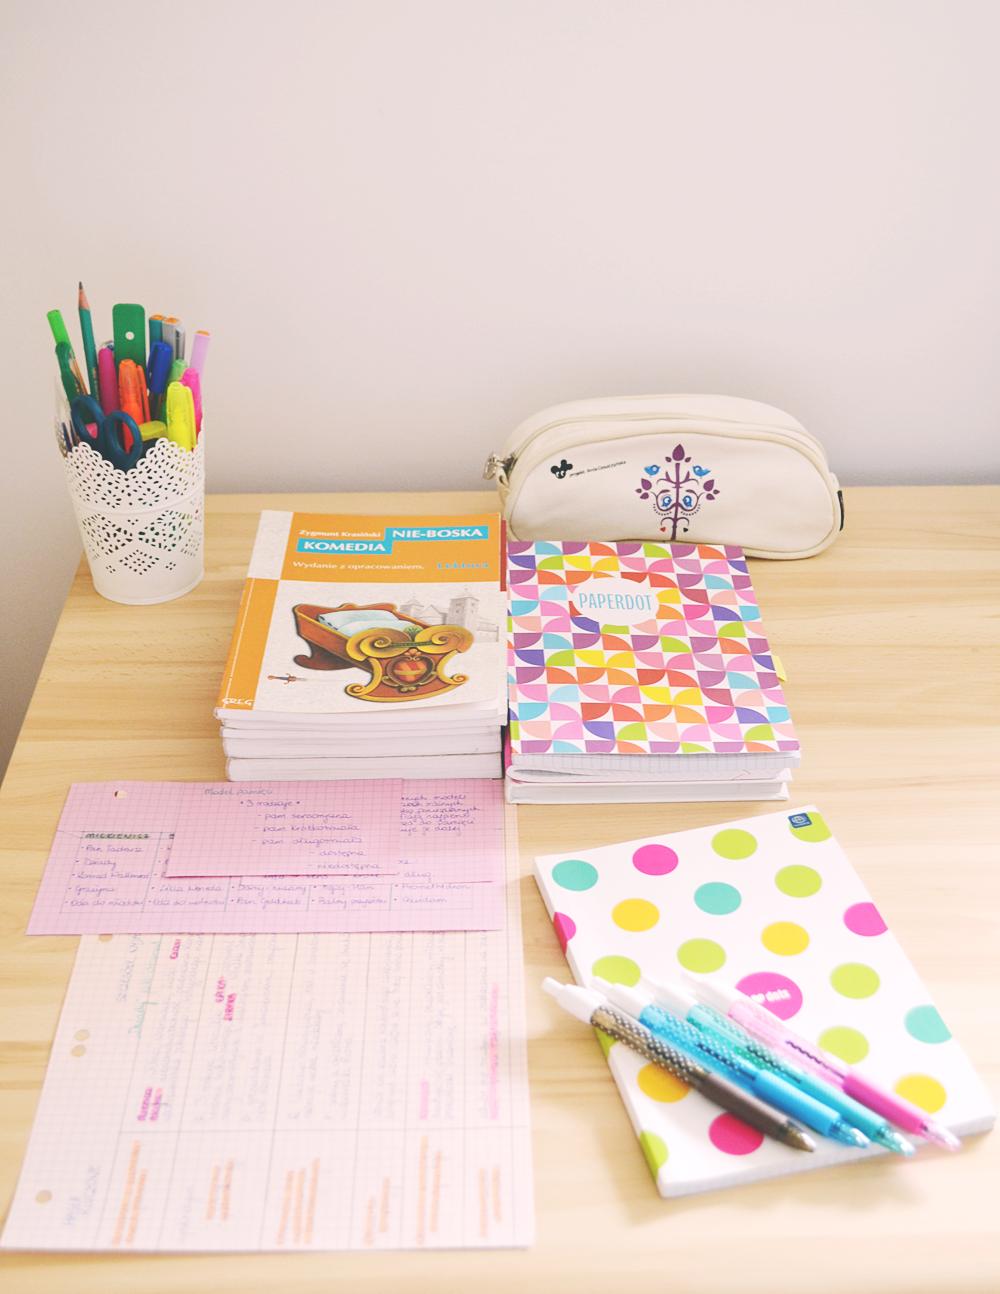 metody robienia notatek 1 kopia